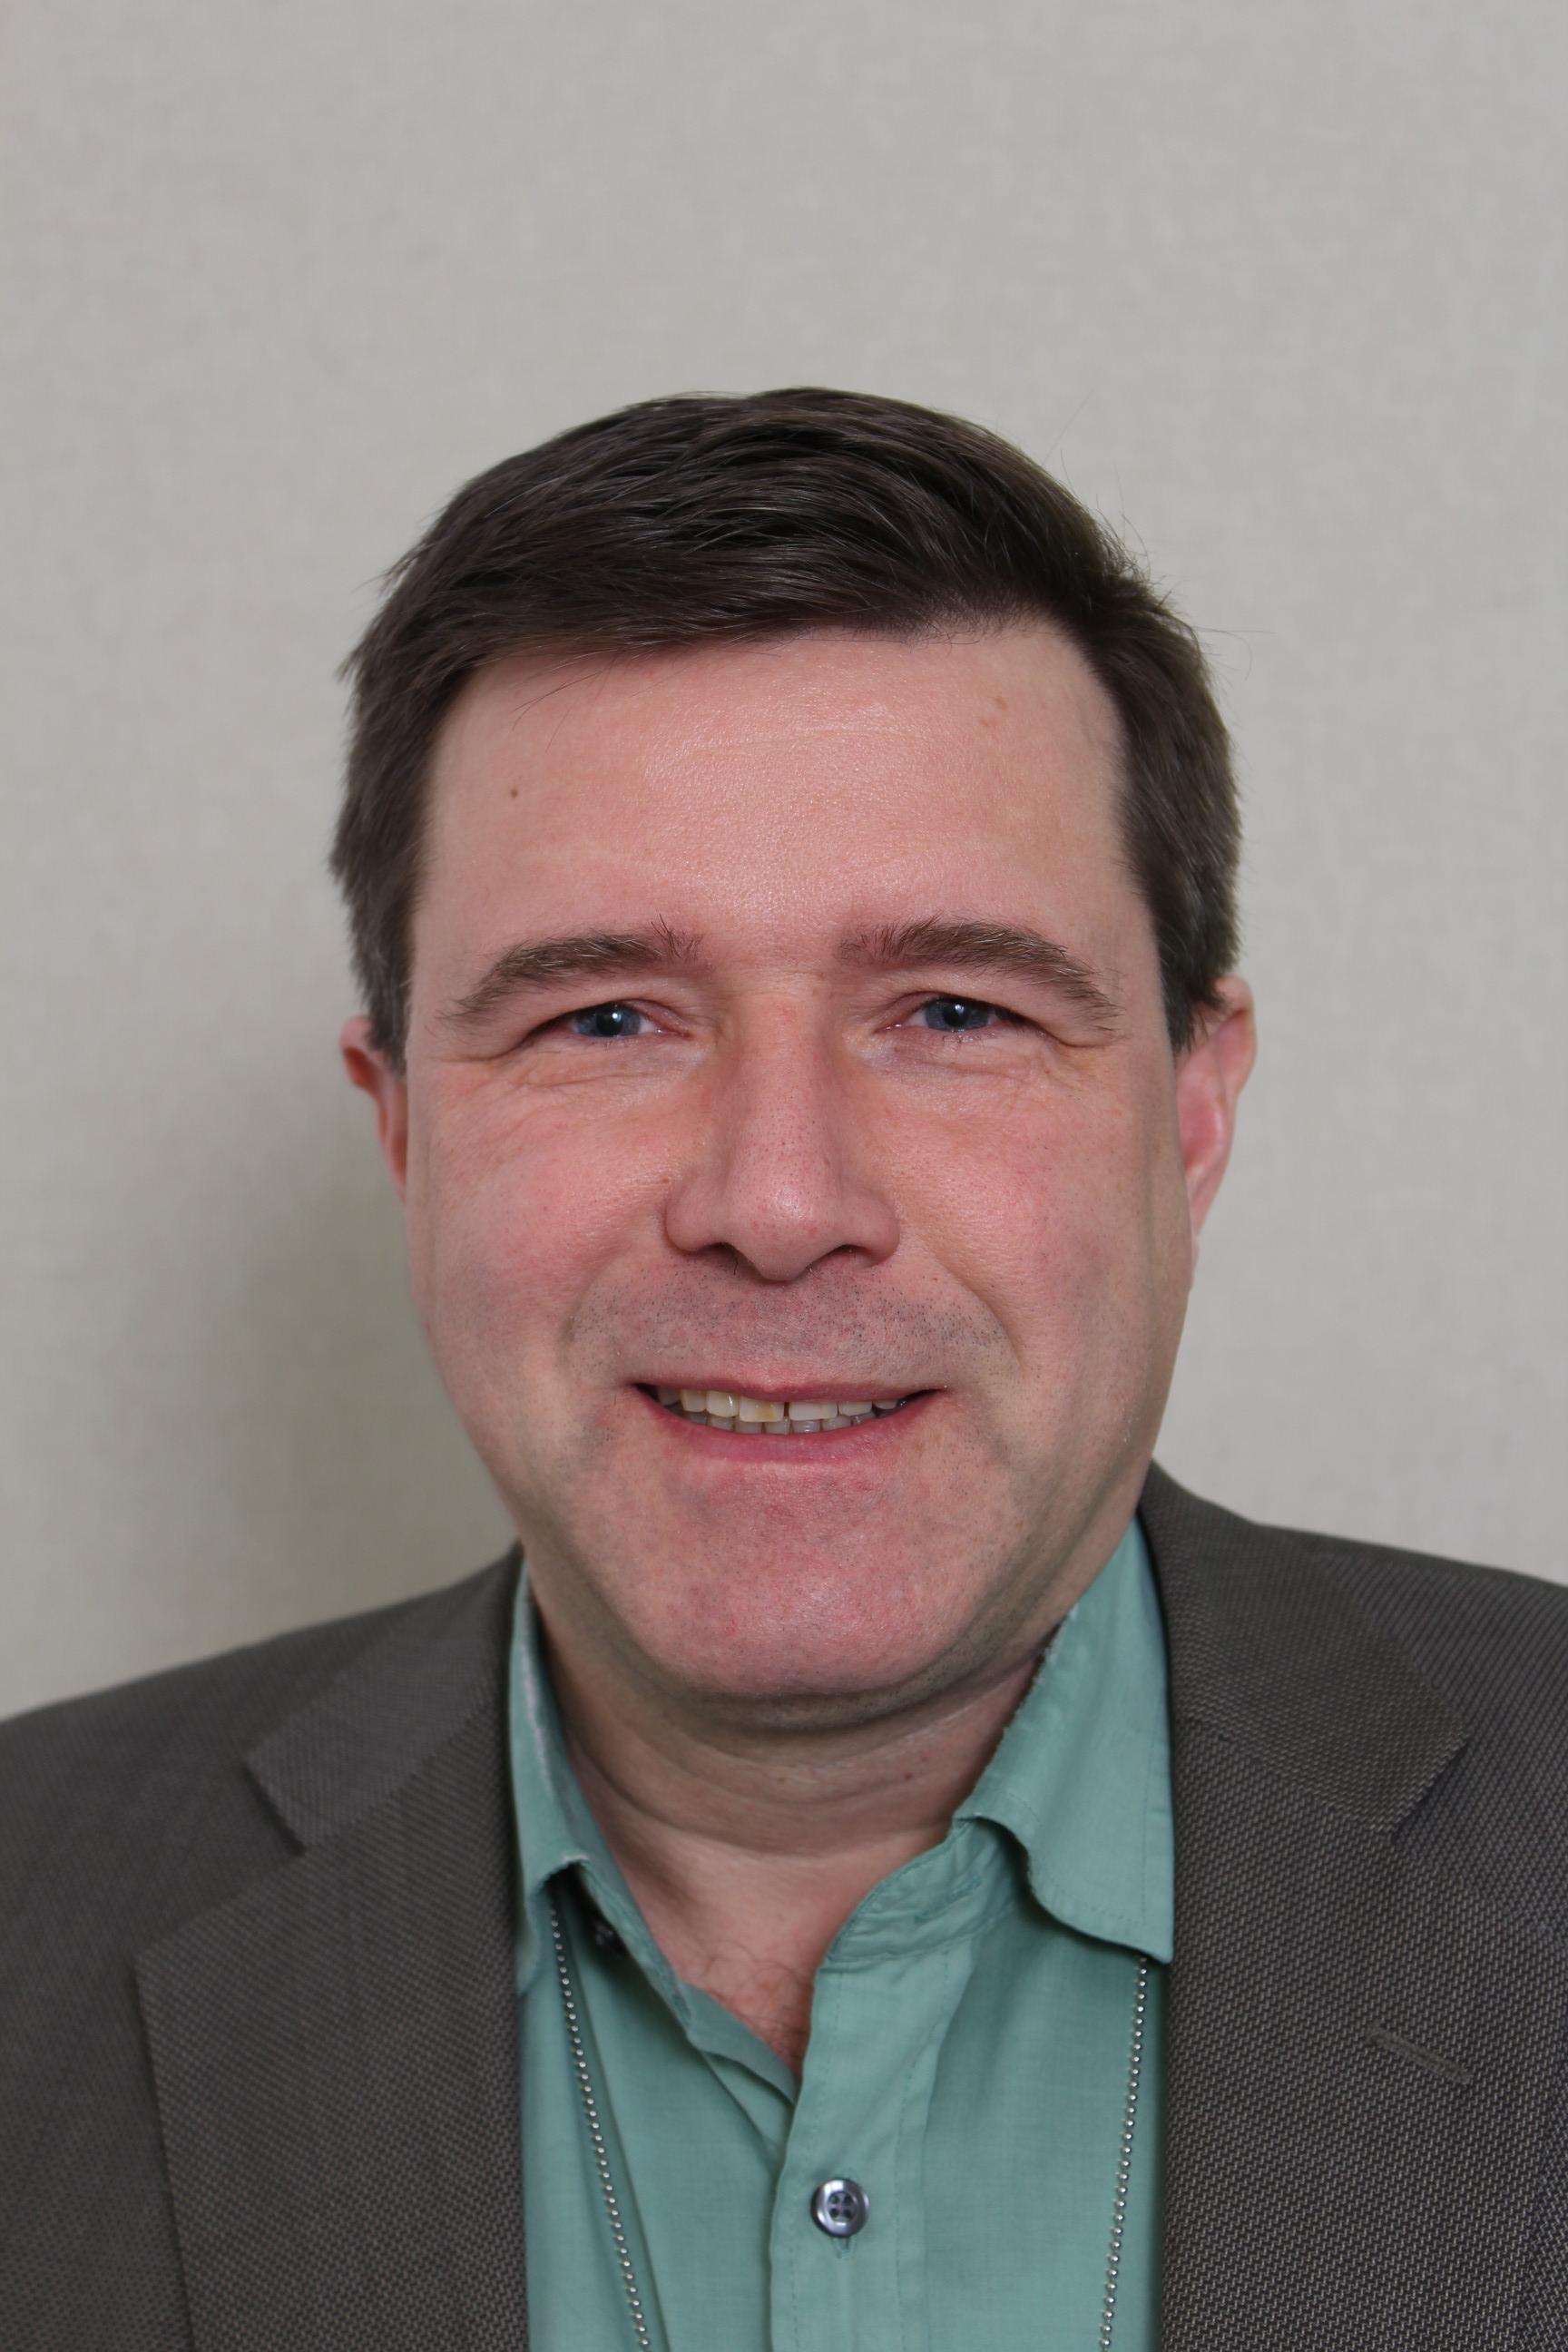 Jukka Hoffren